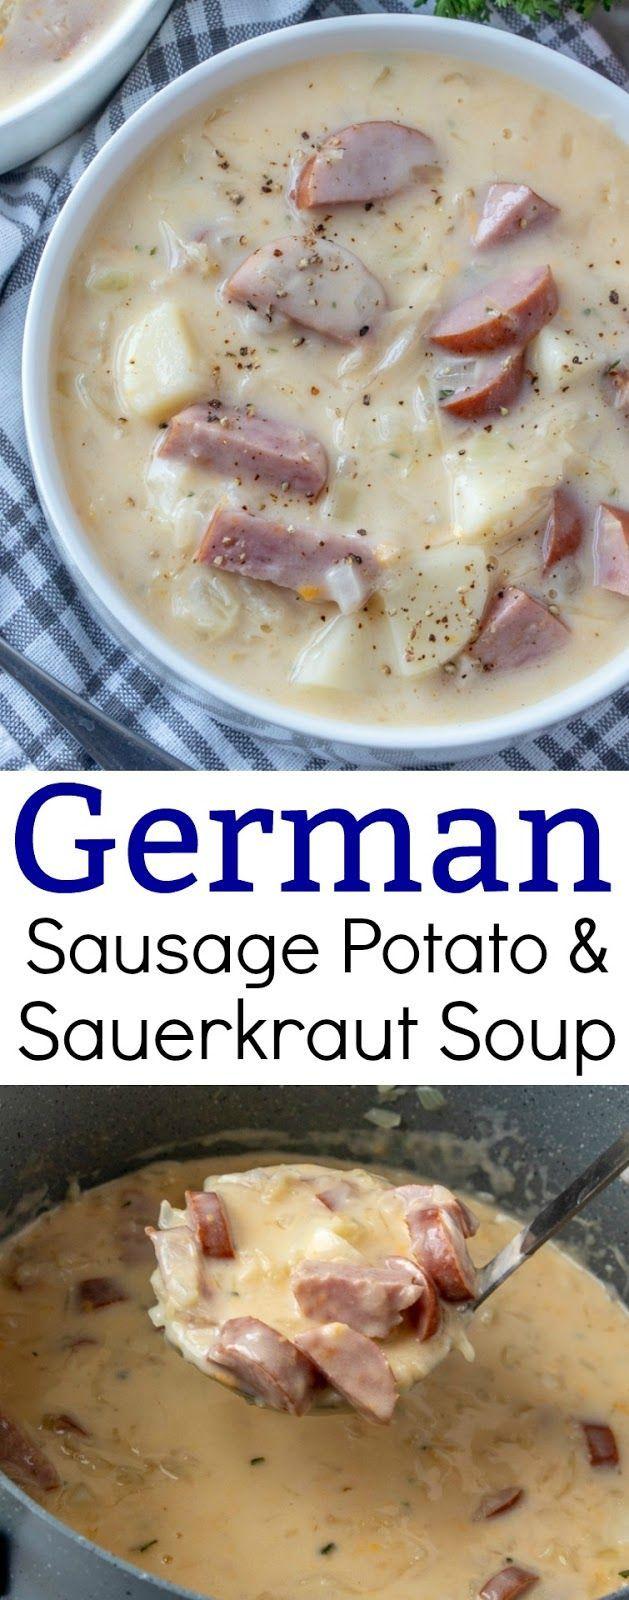 Creamy German Sausage, Potato and Sauerkraut Soup Recipe #dinnerideas2019